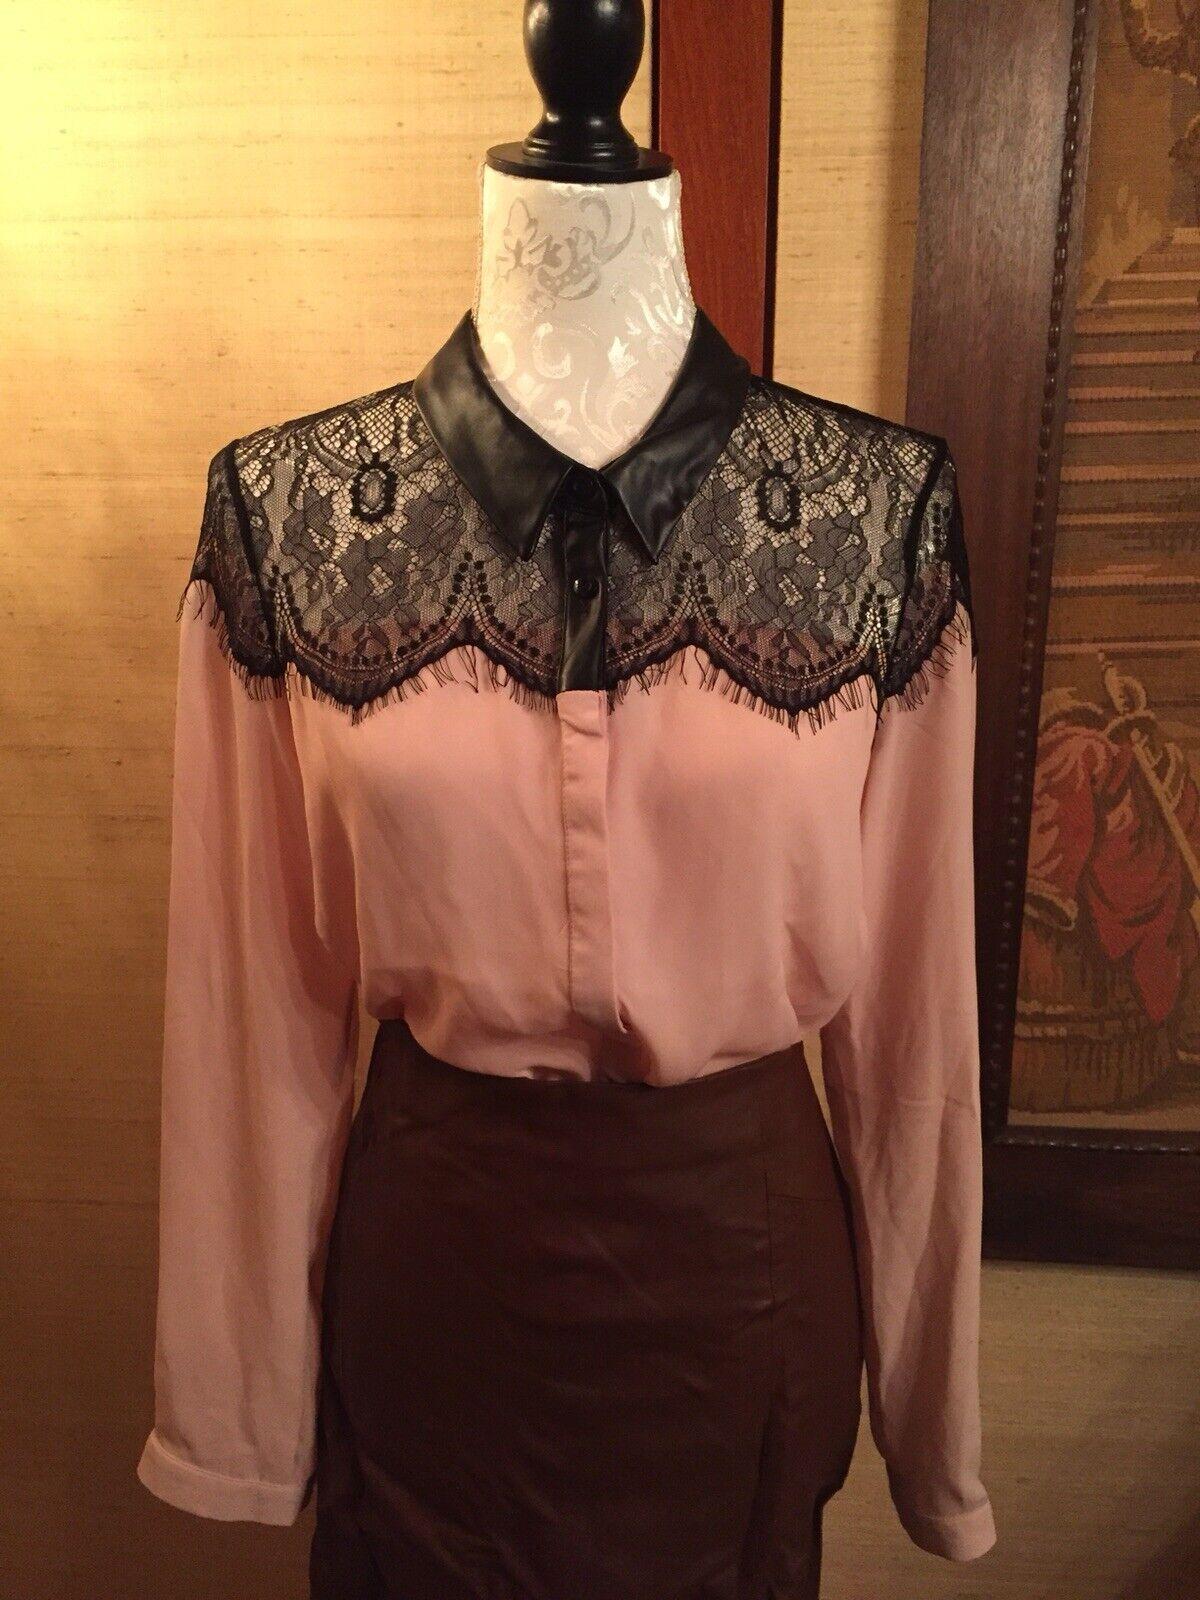 LIPSY x Michelle Keegan Blause Shirt 38 14 Rosa Spitze Lederkragen Pastell miu